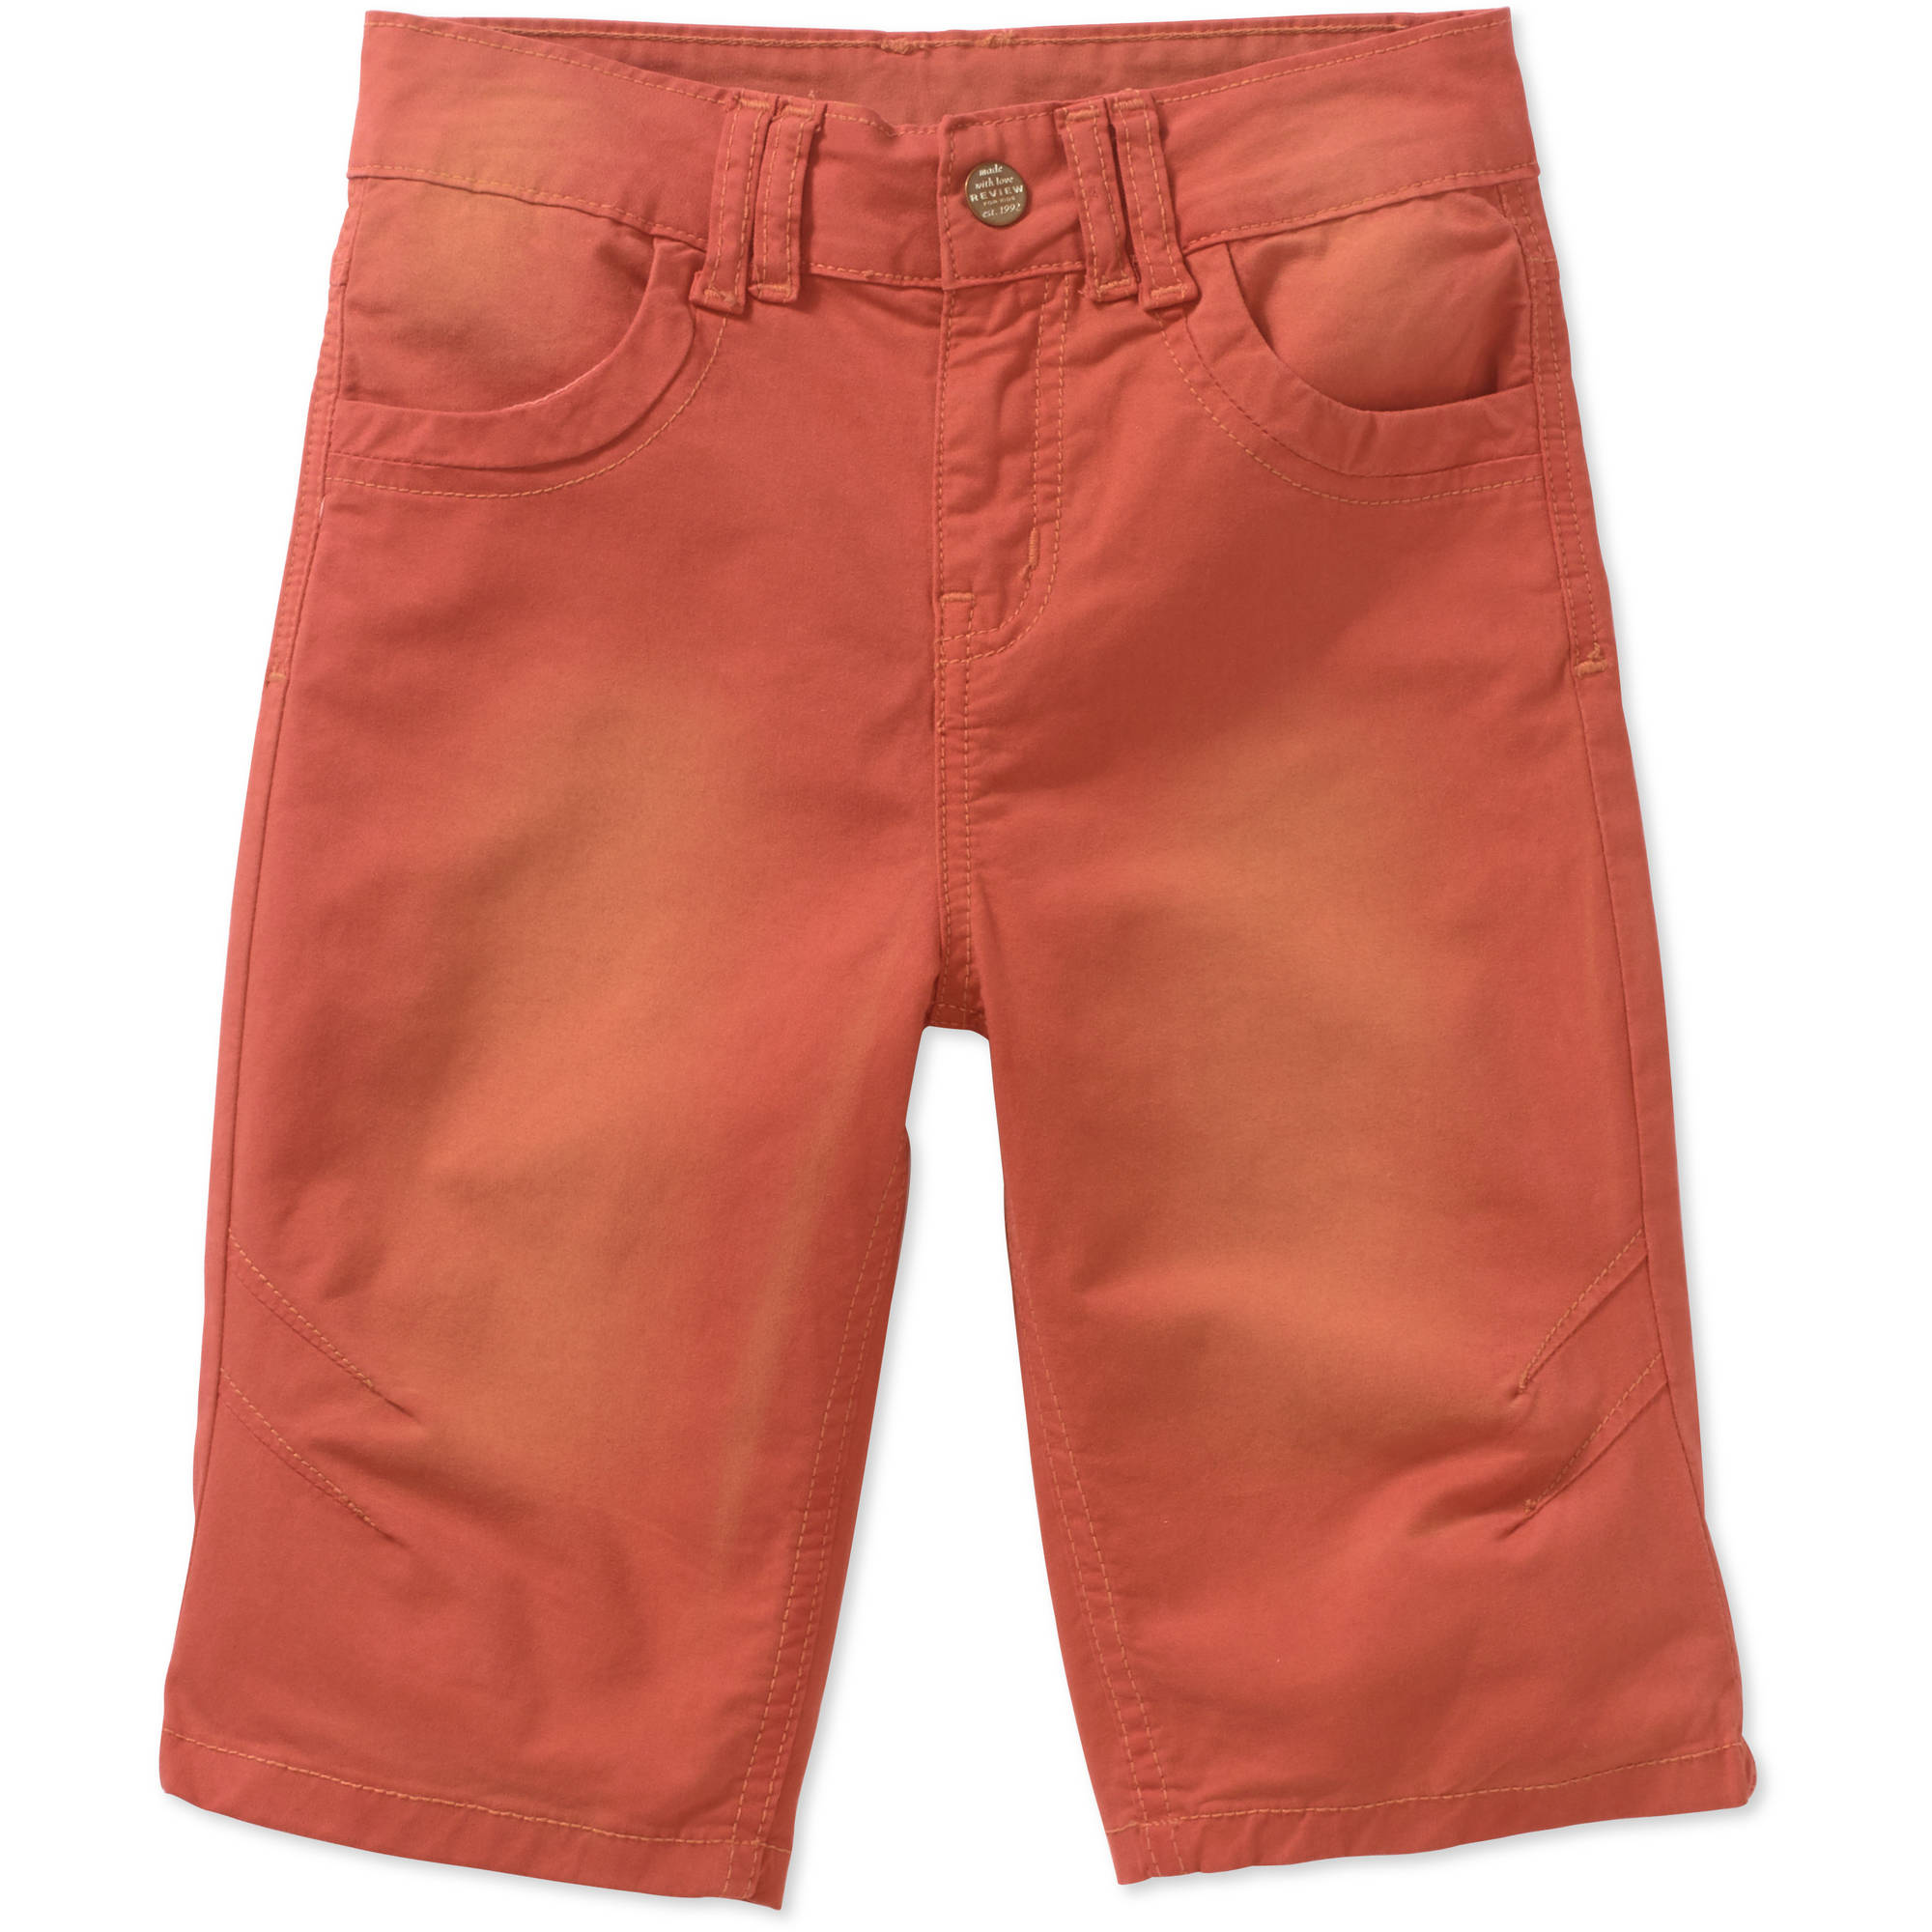 Boys' Shorts - Walmart.com